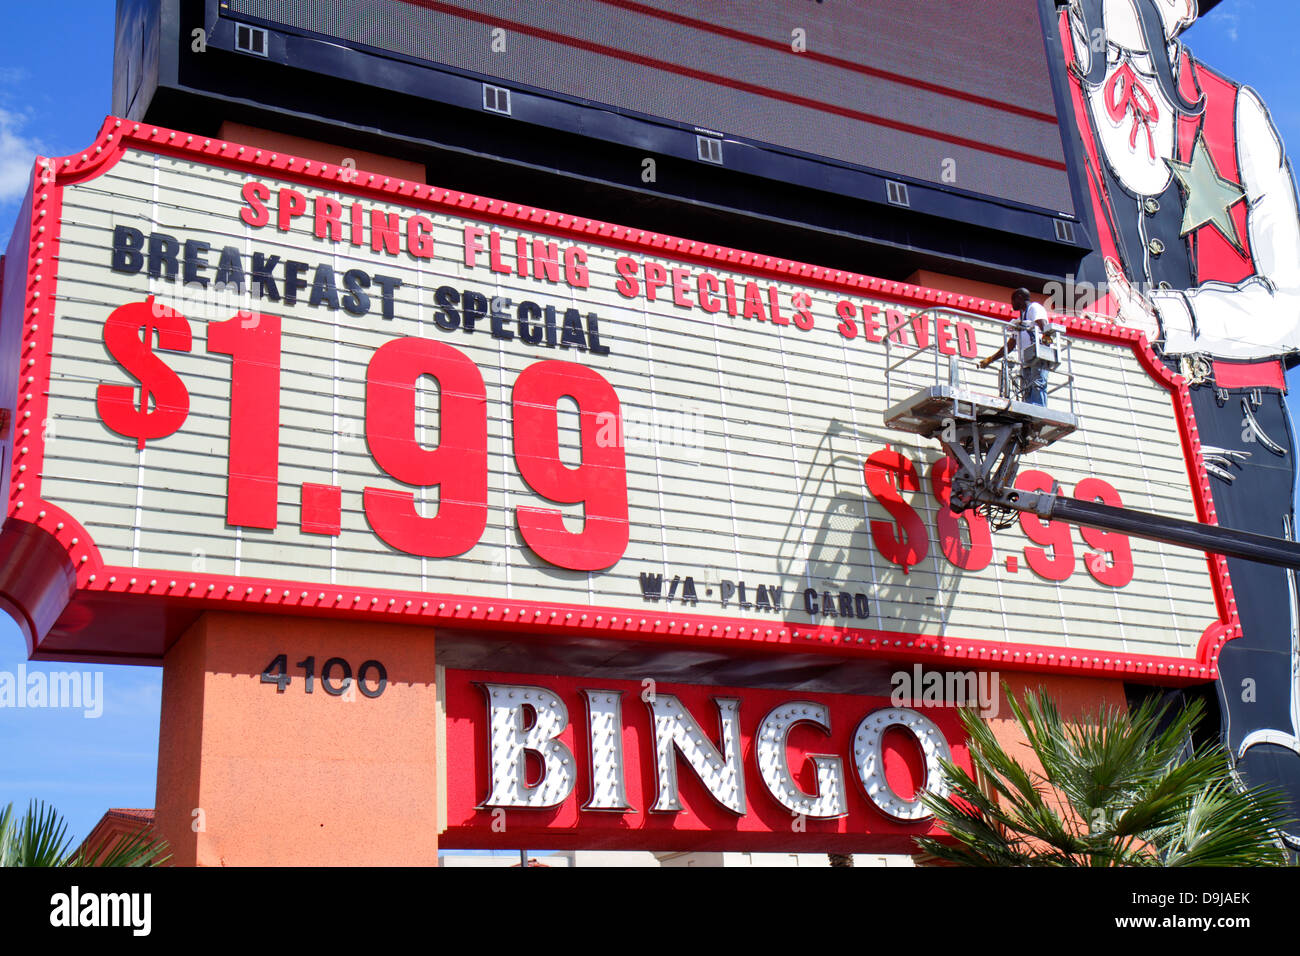 Terrribles las vegas casino o/online casino turnkey-direct-3.txt 3